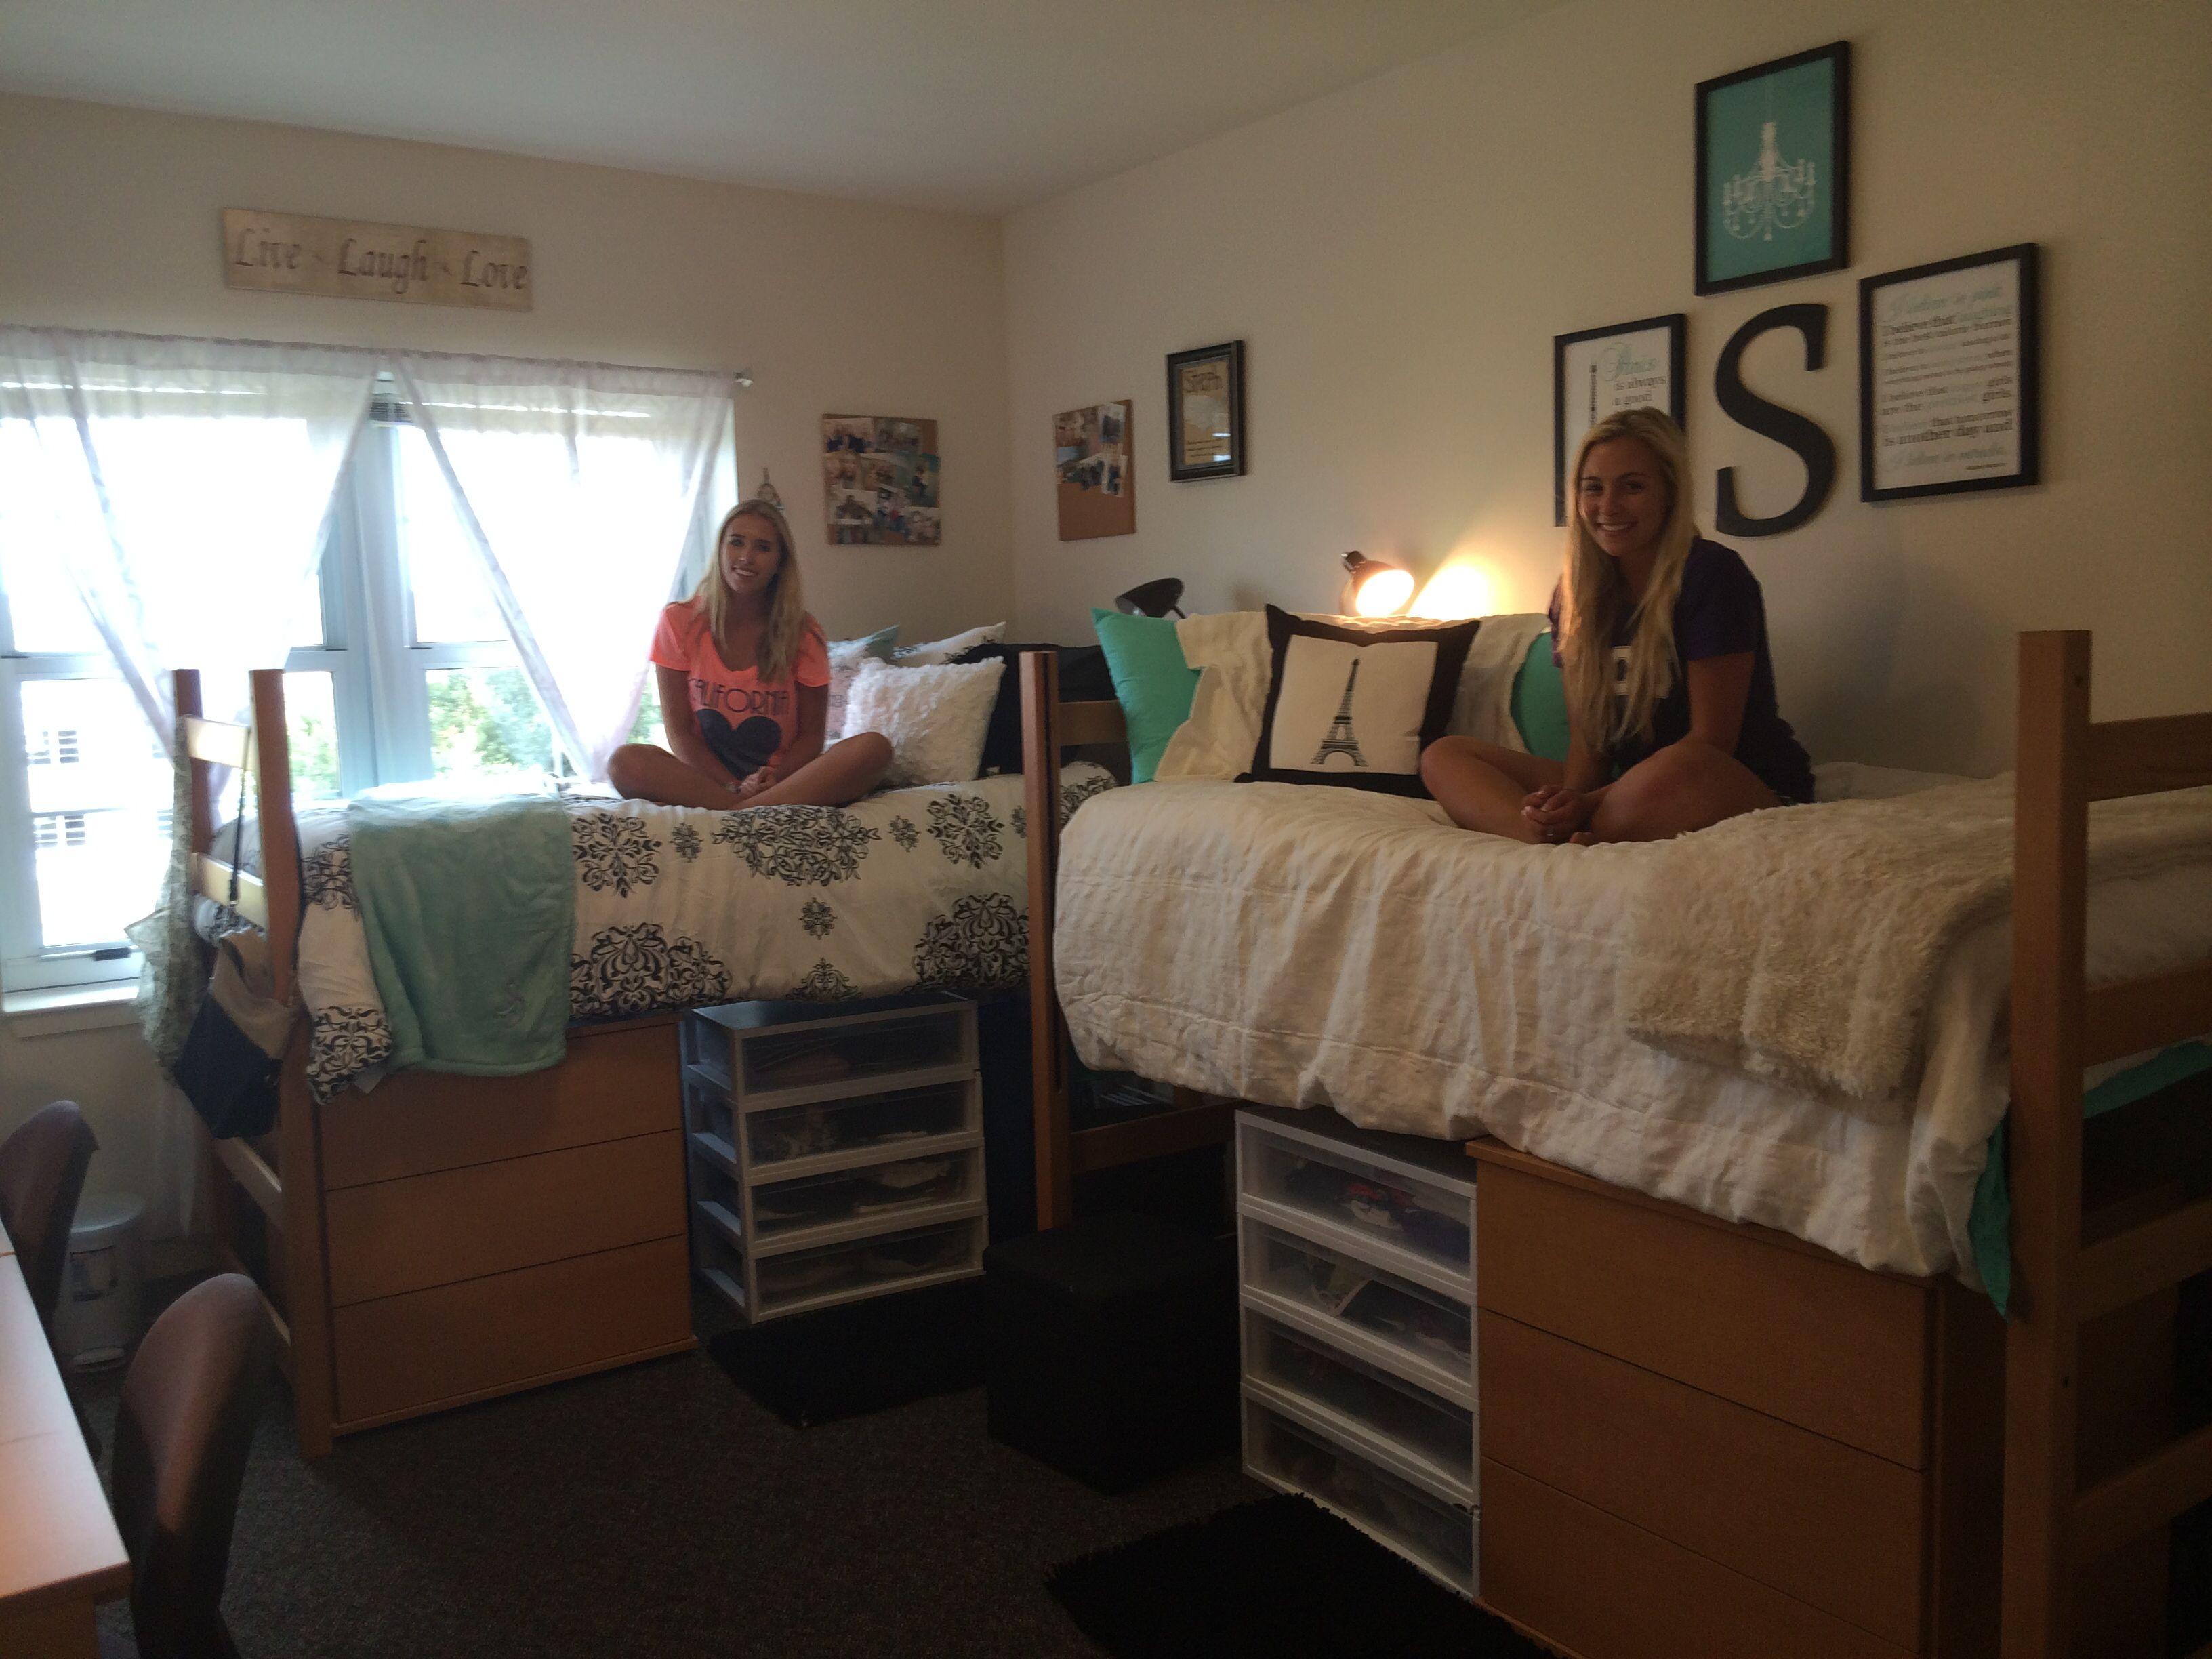 Organized and spacious dorm room tcu sherley hall